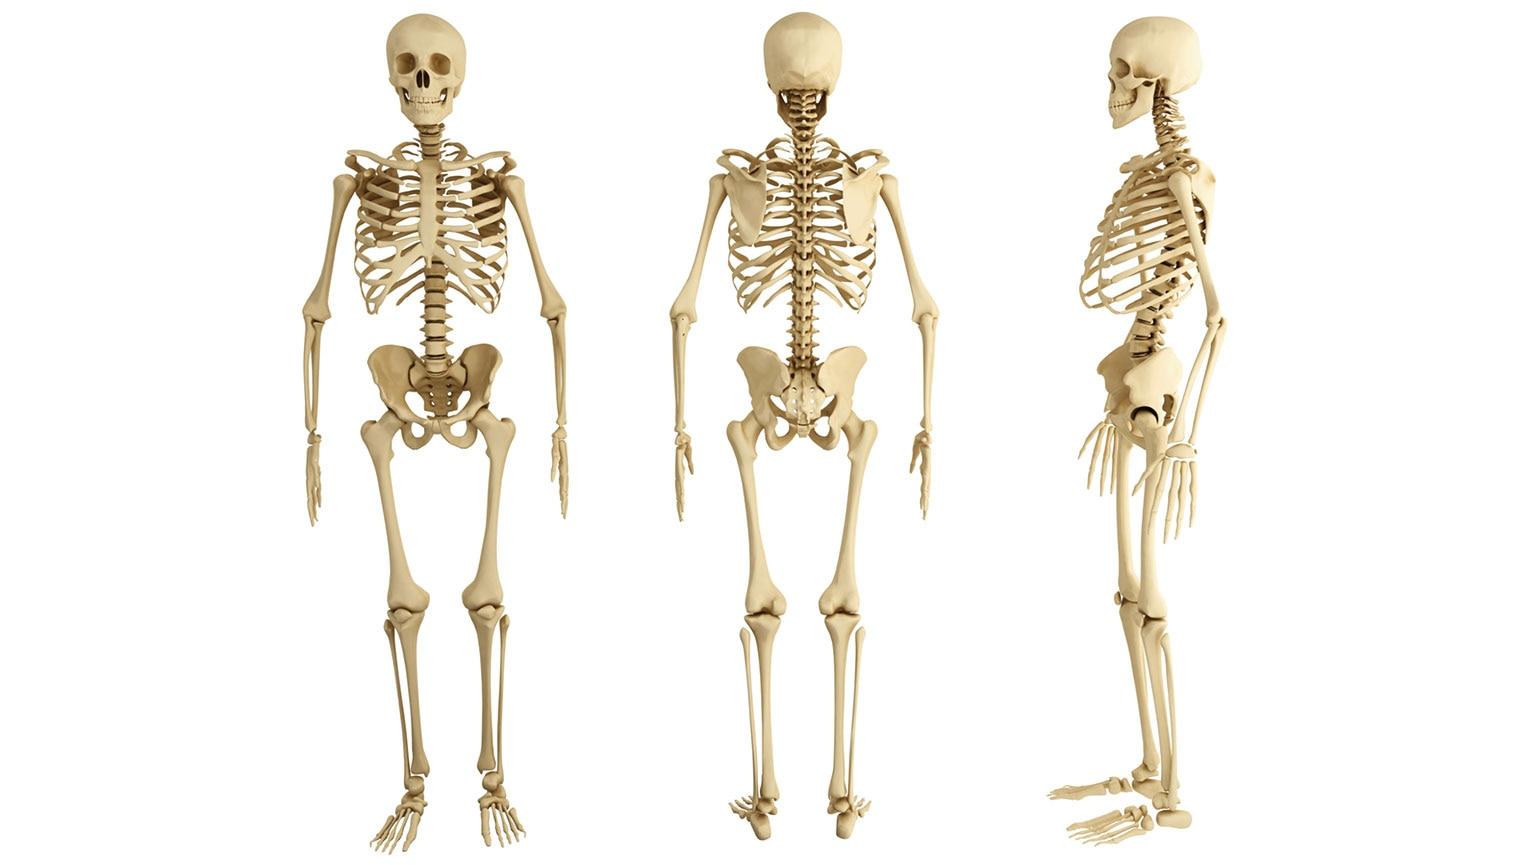 Musculoskeletal System—Bones